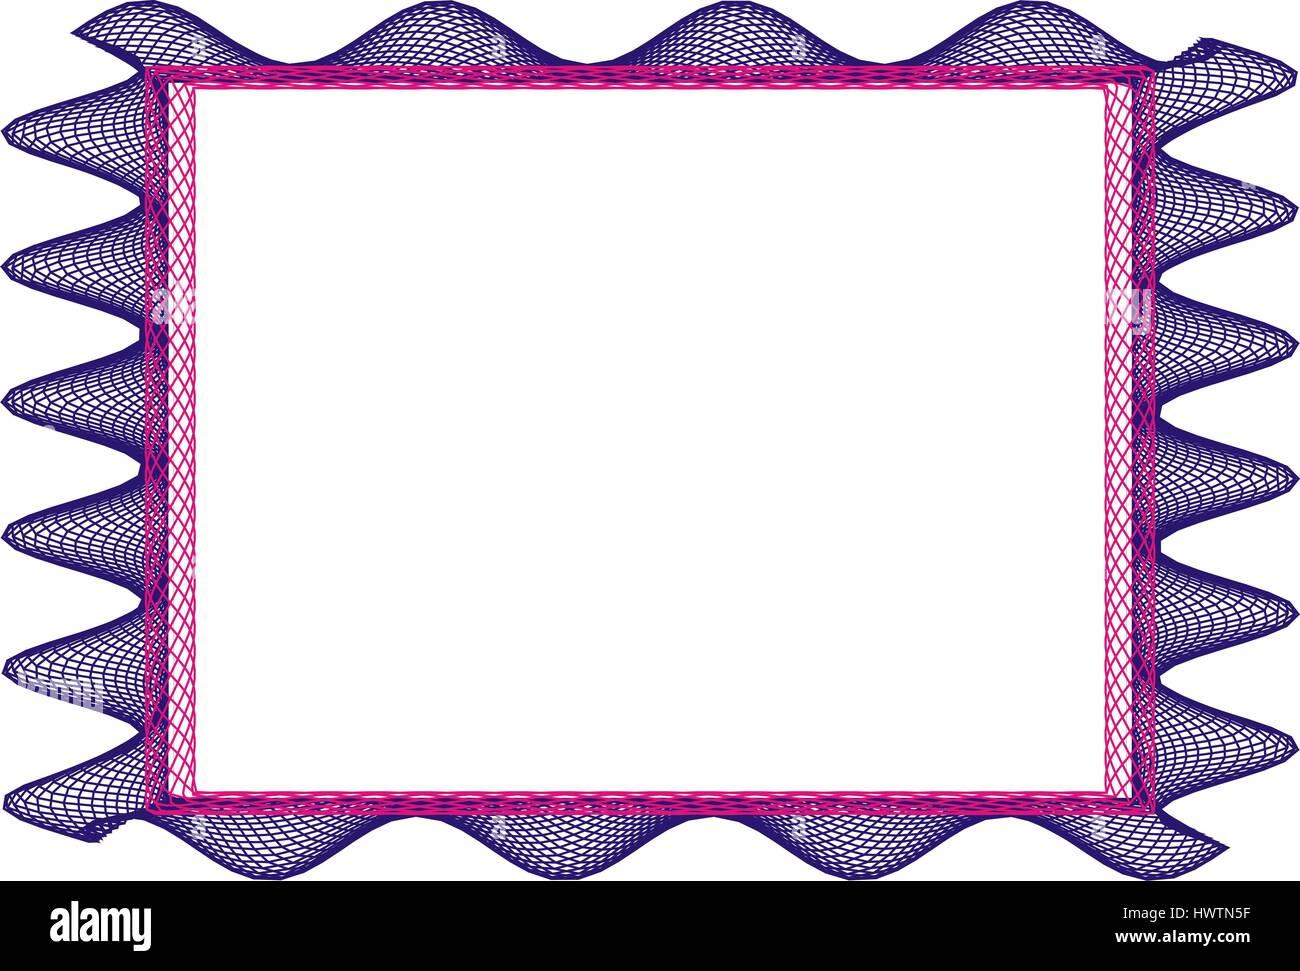 Certificate Corner Stockfotos & Certificate Corner Bilder - Alamy